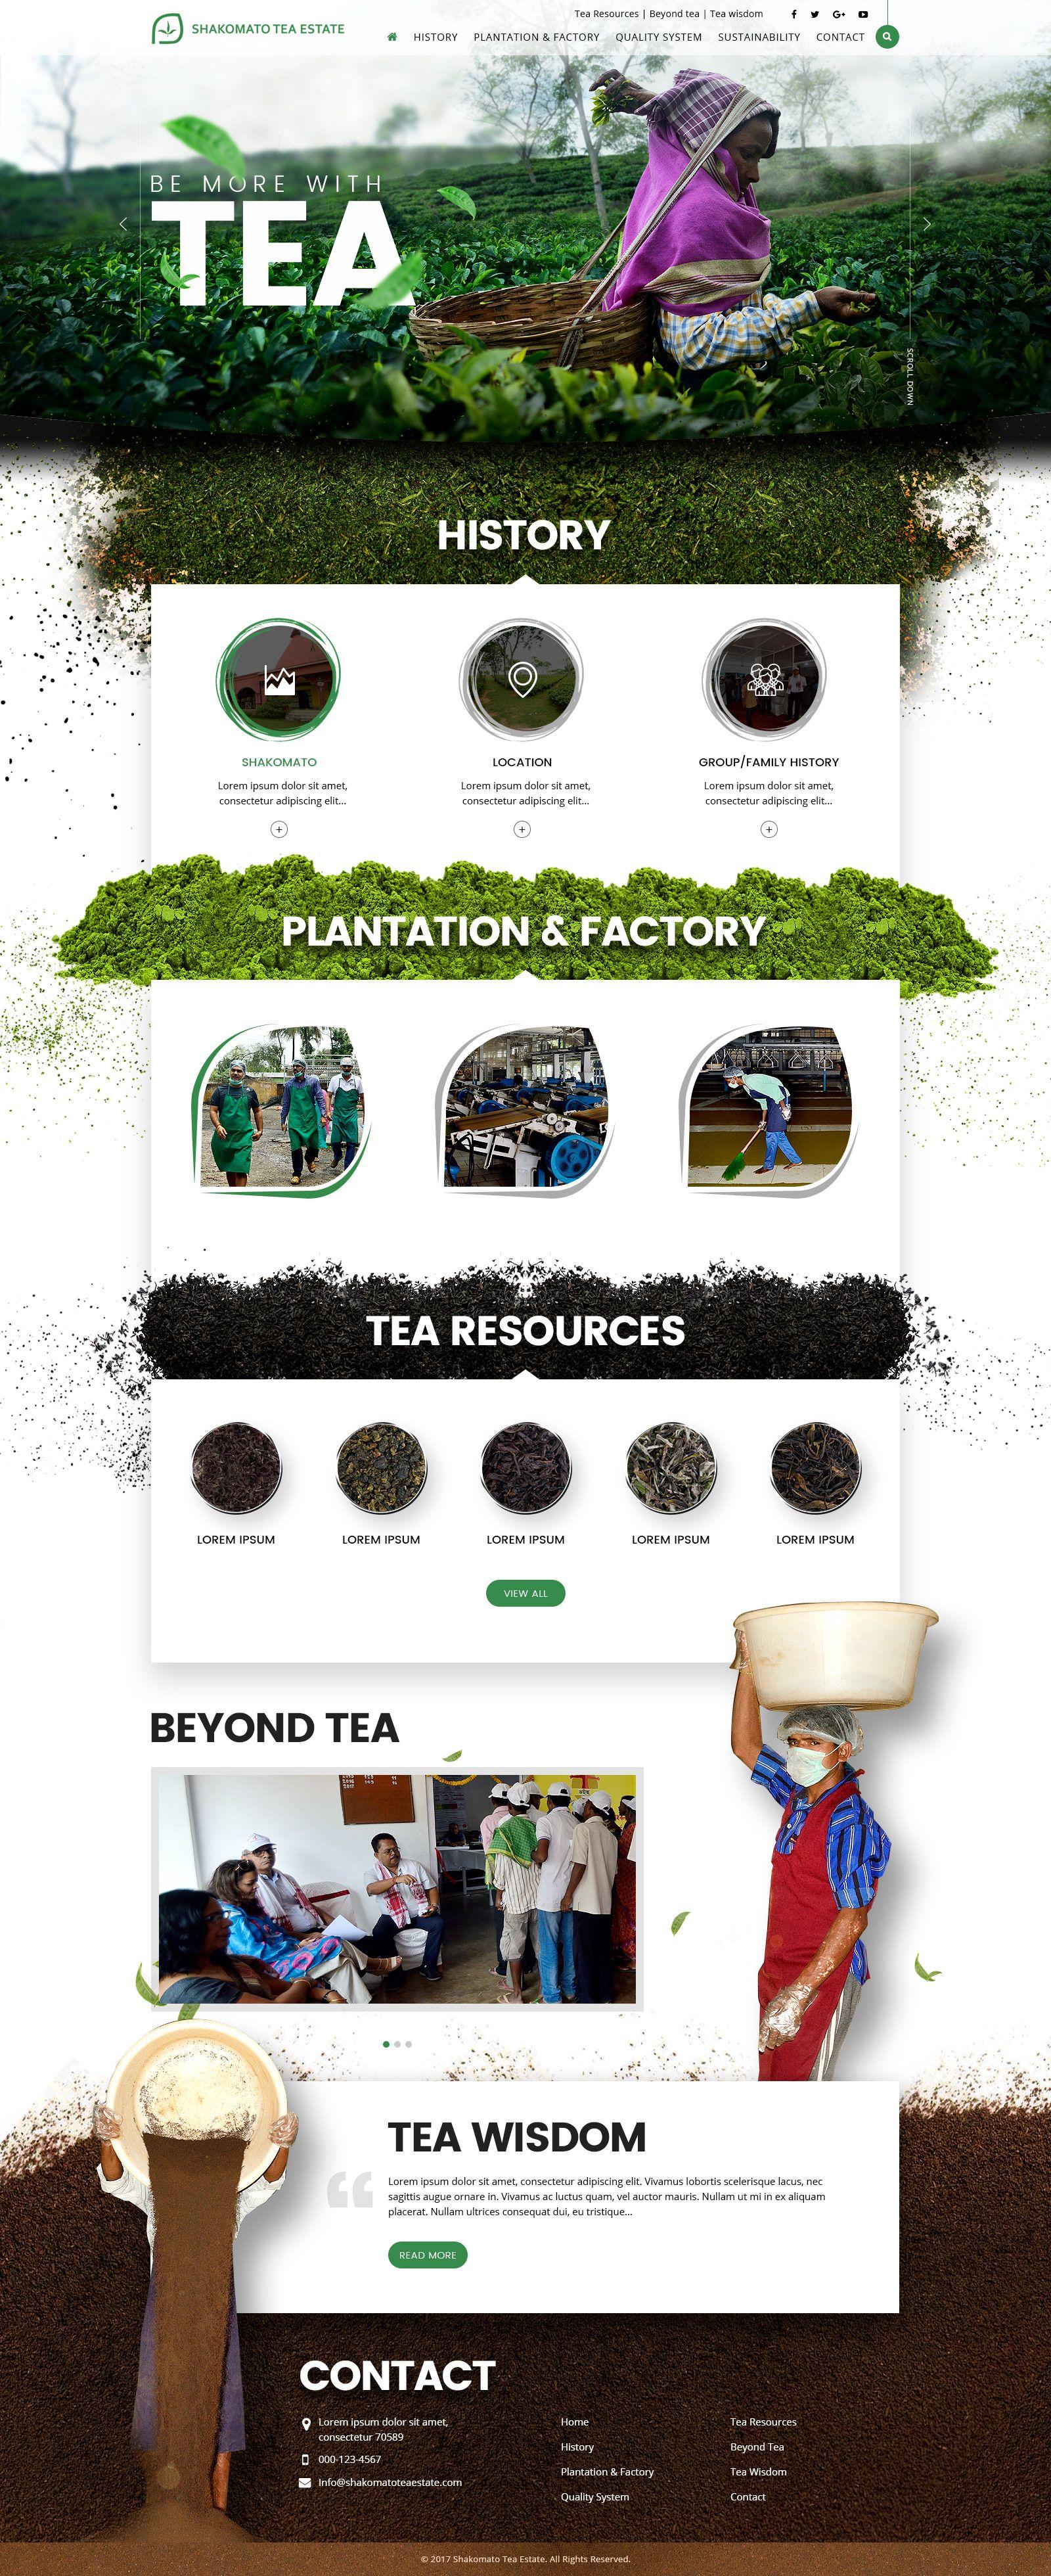 Website Design Tea Processing Webdesign Tea Sajt Dizajn Kofe